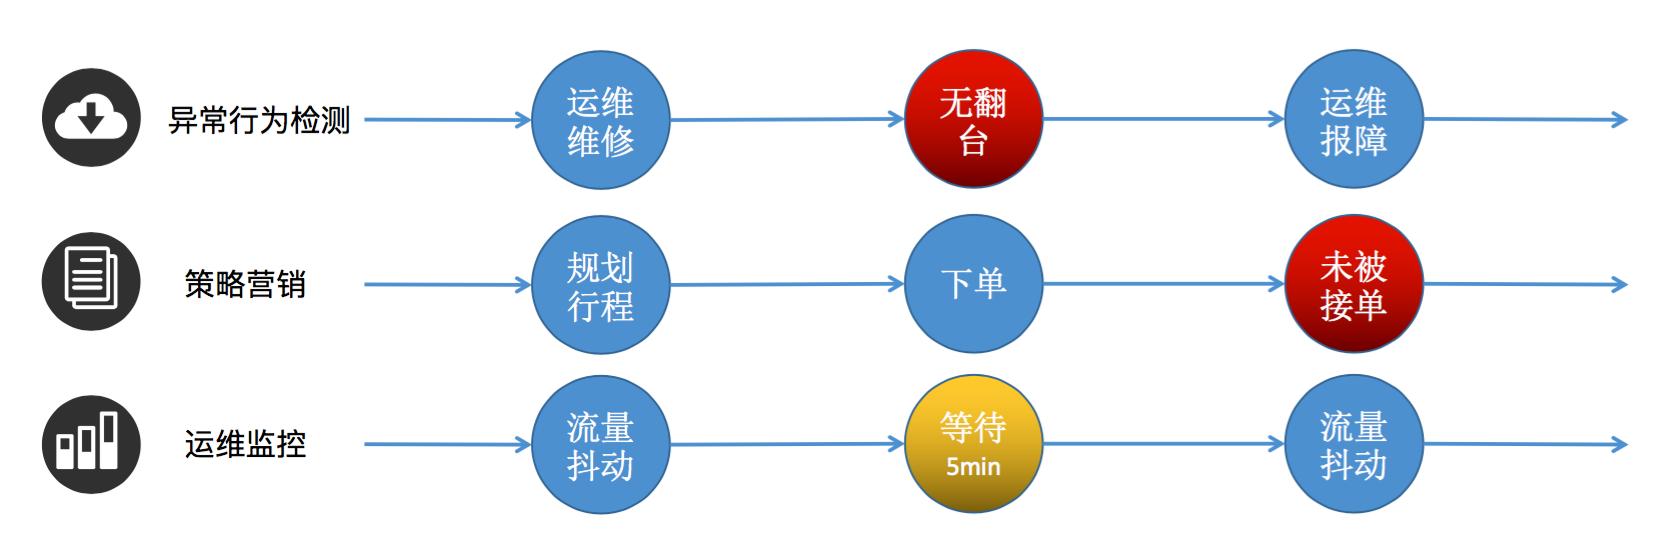 01Flink示例.png